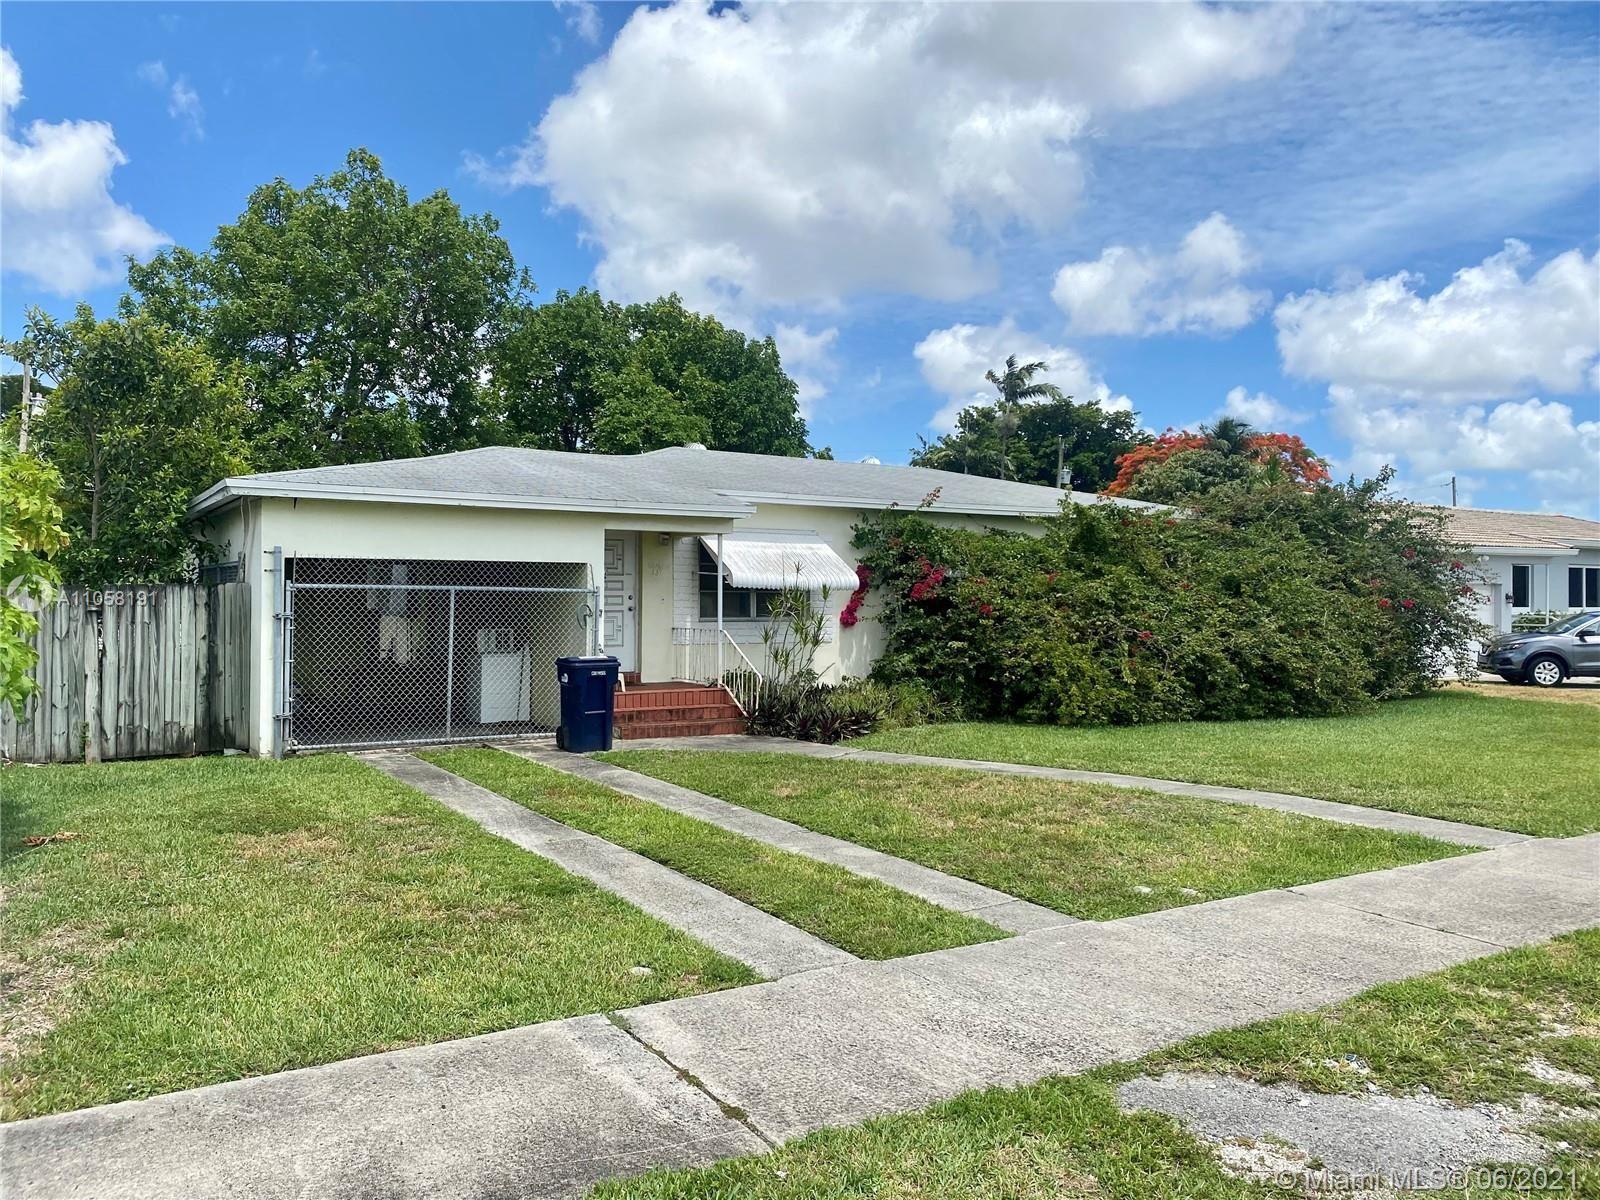 351 East Dr, Miami Springs, FL 33166 - #: A11058191